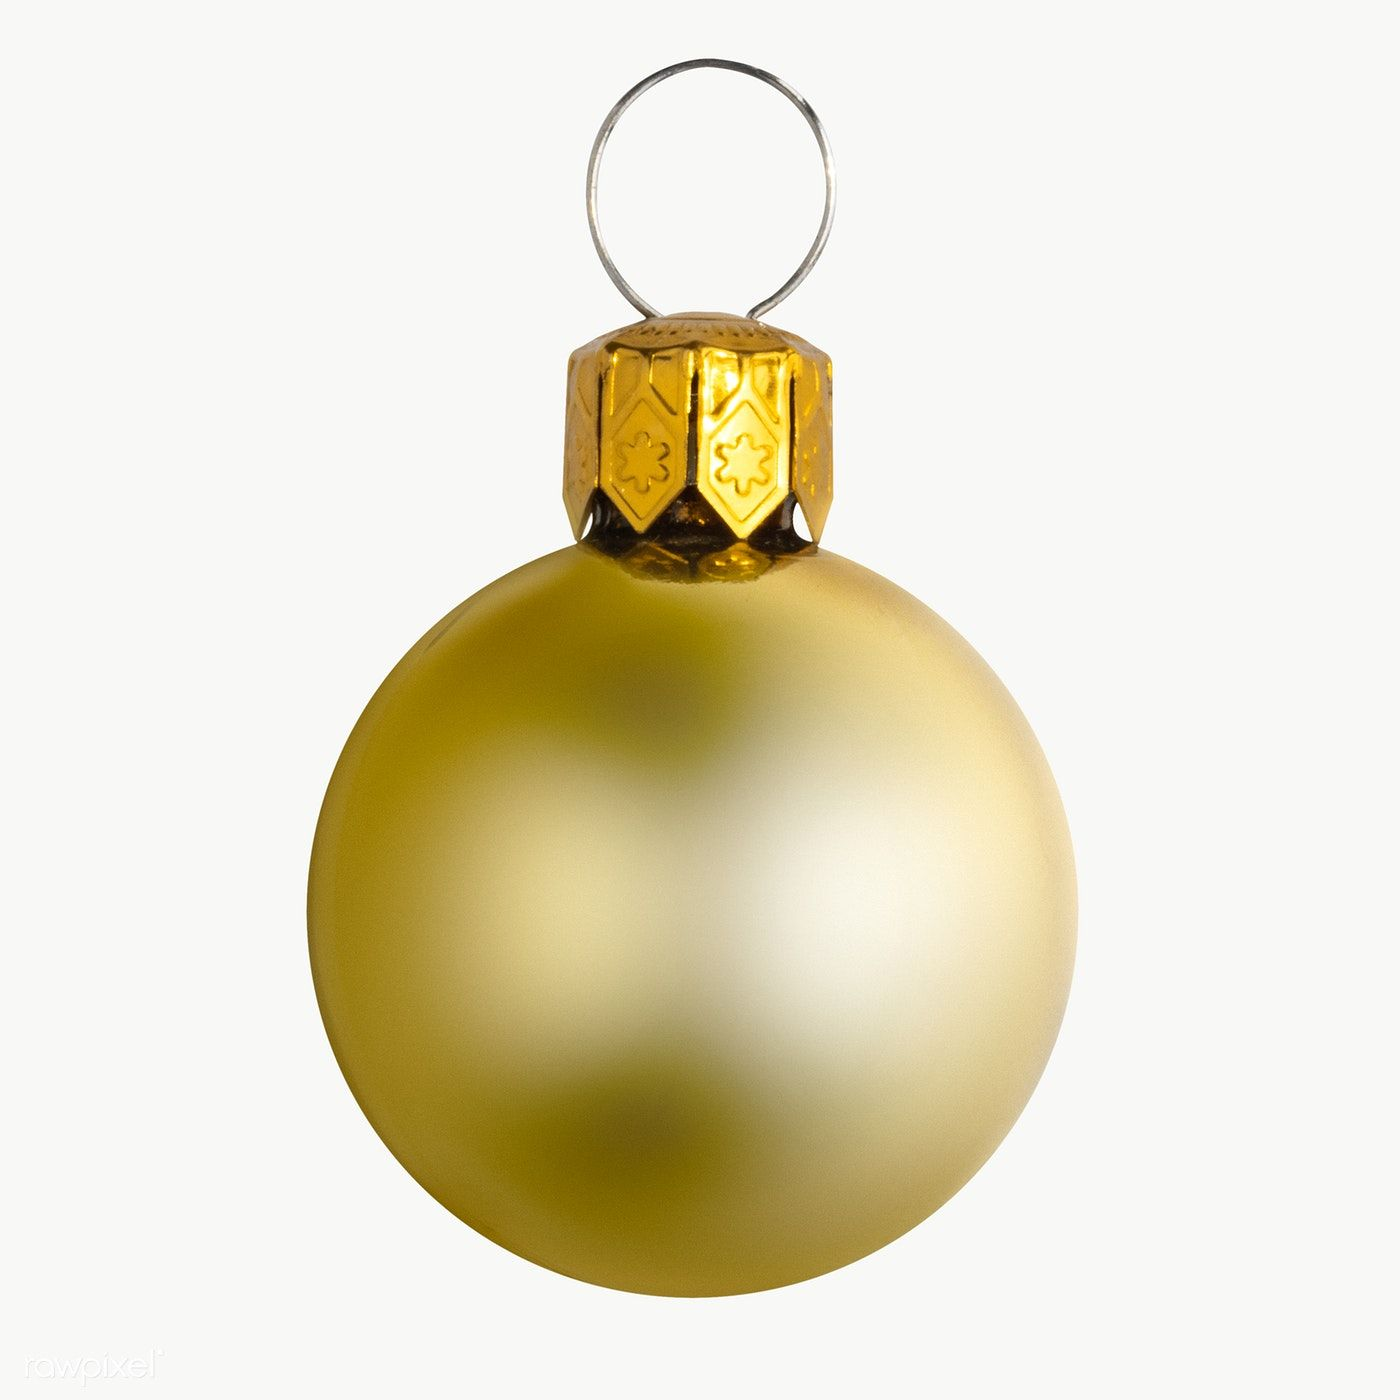 A Shiny Gold Ball Christmas Ornament On Transparent Free Image By Rawpixel Com Jira Christmas Ornaments Christmas Bulbs Transparent